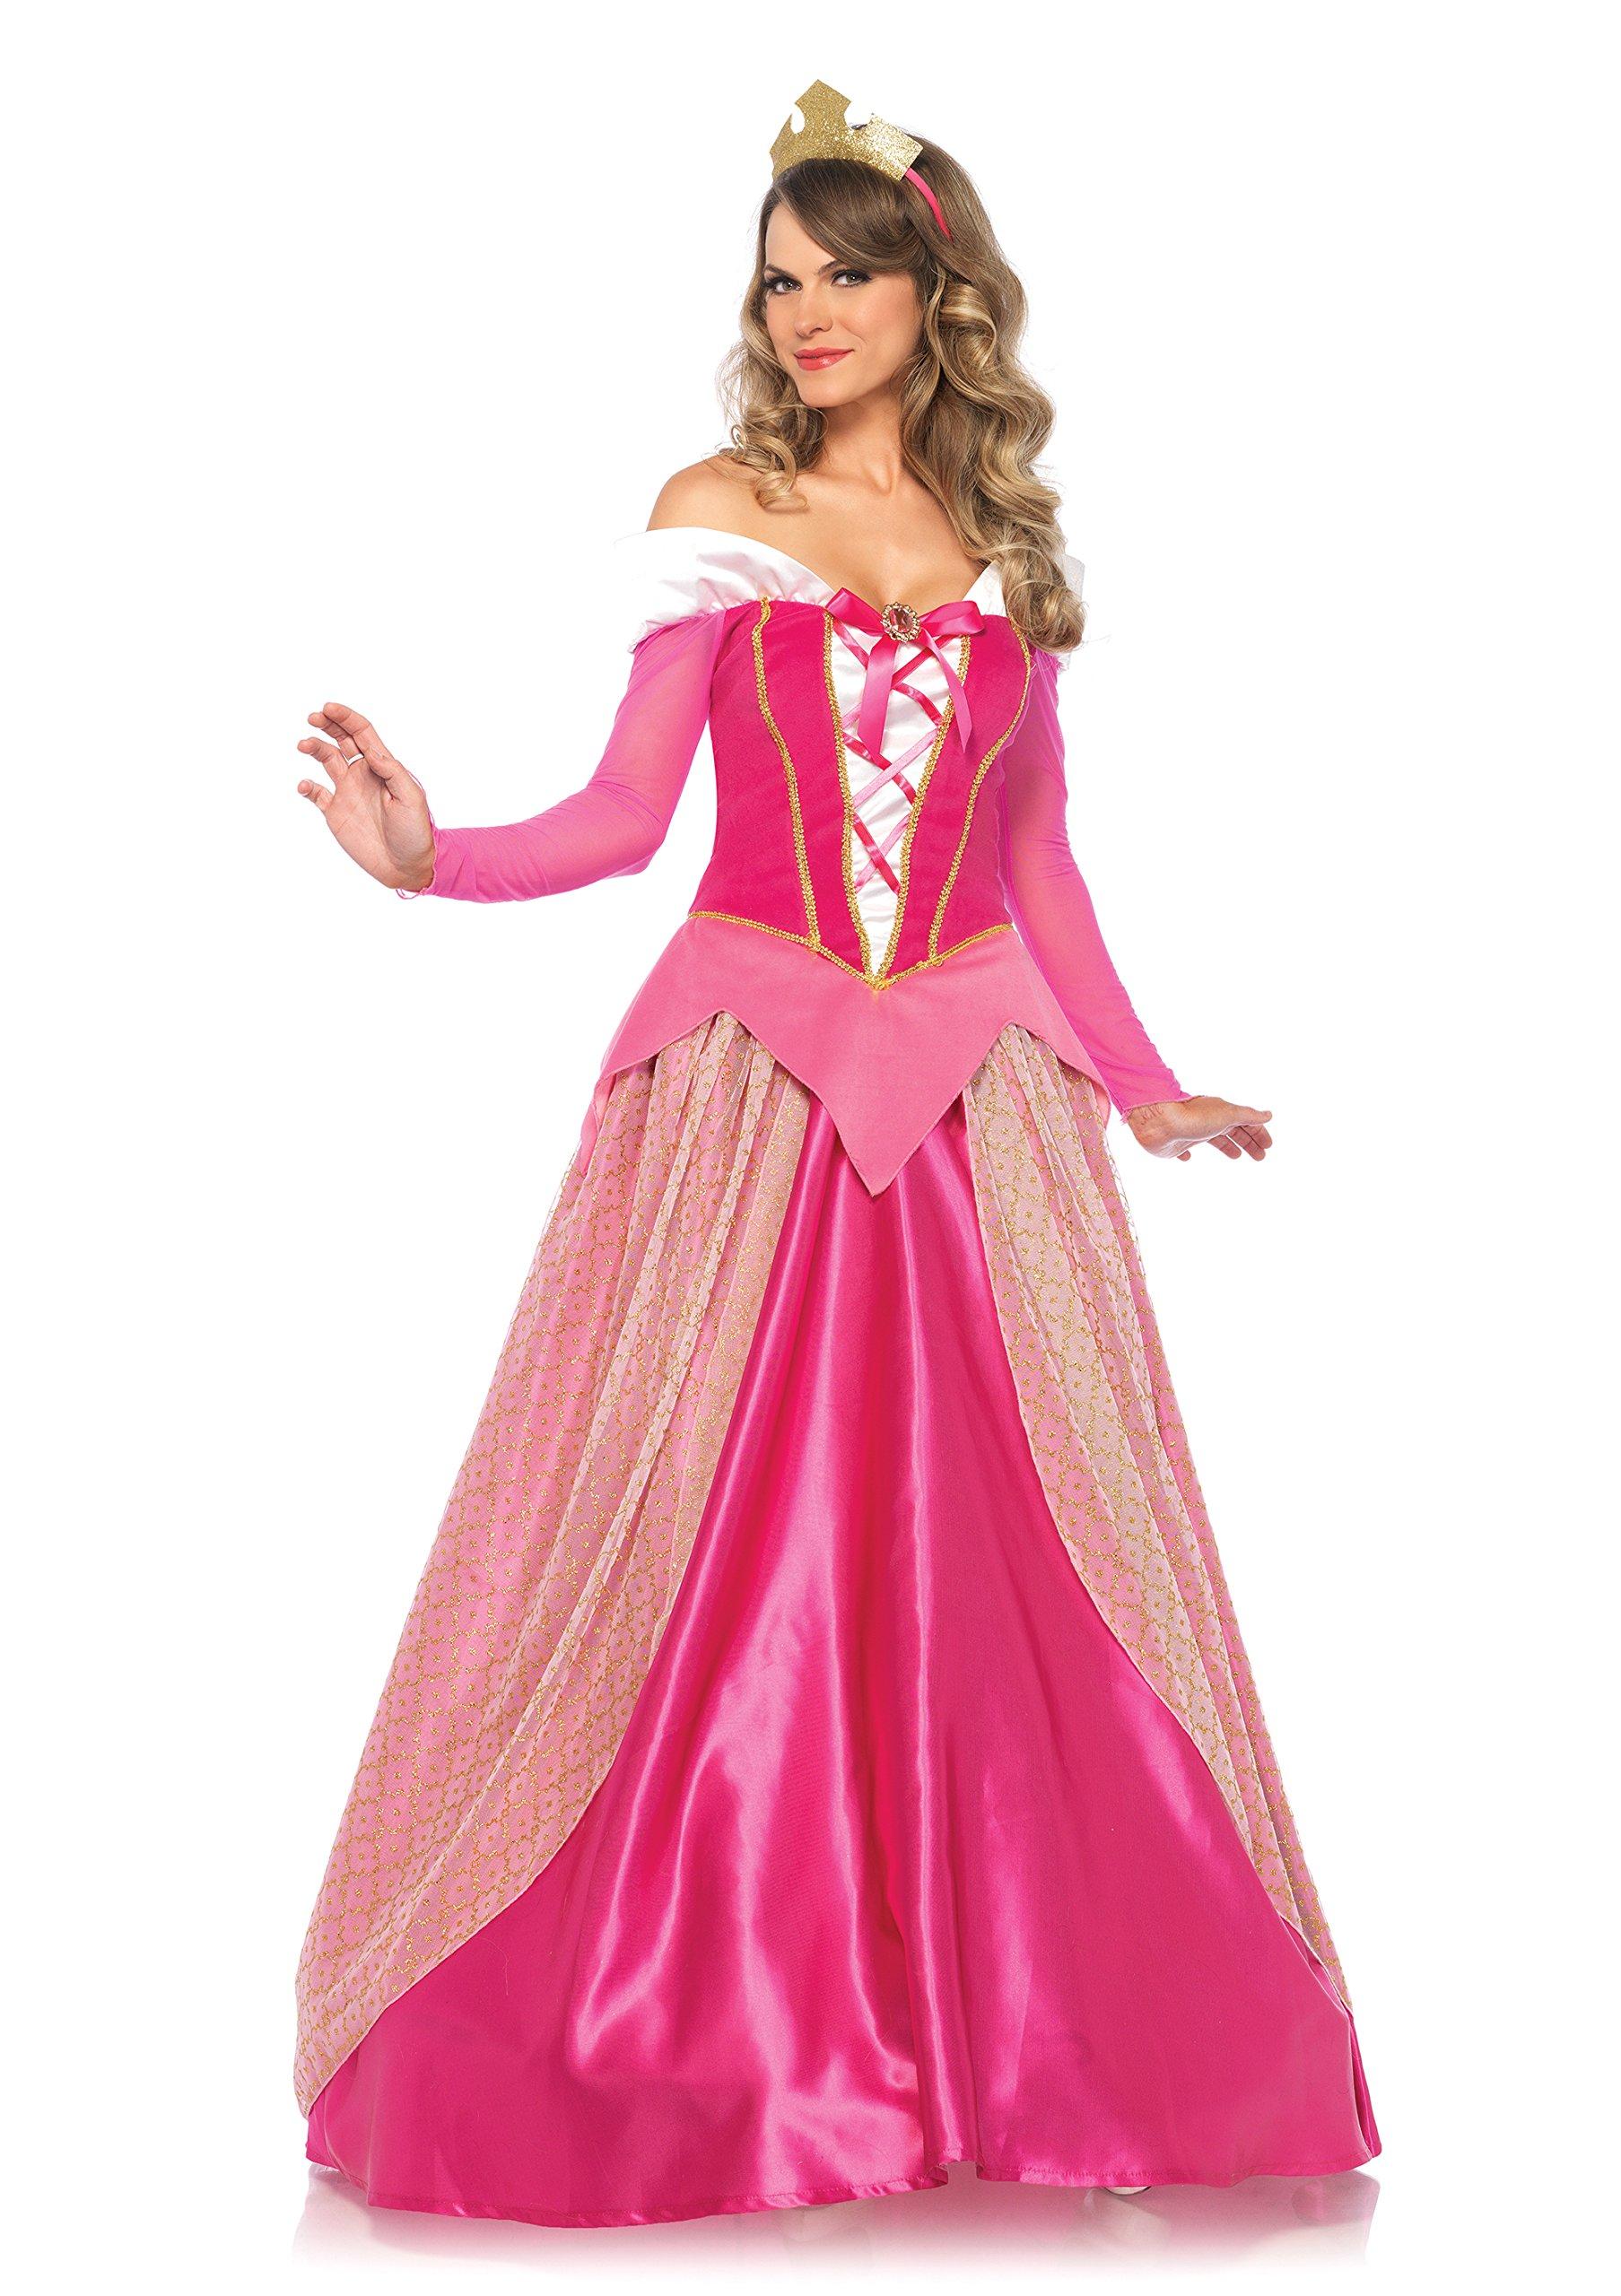 Disney Women's Princess Aurora Costume, Pink, Large